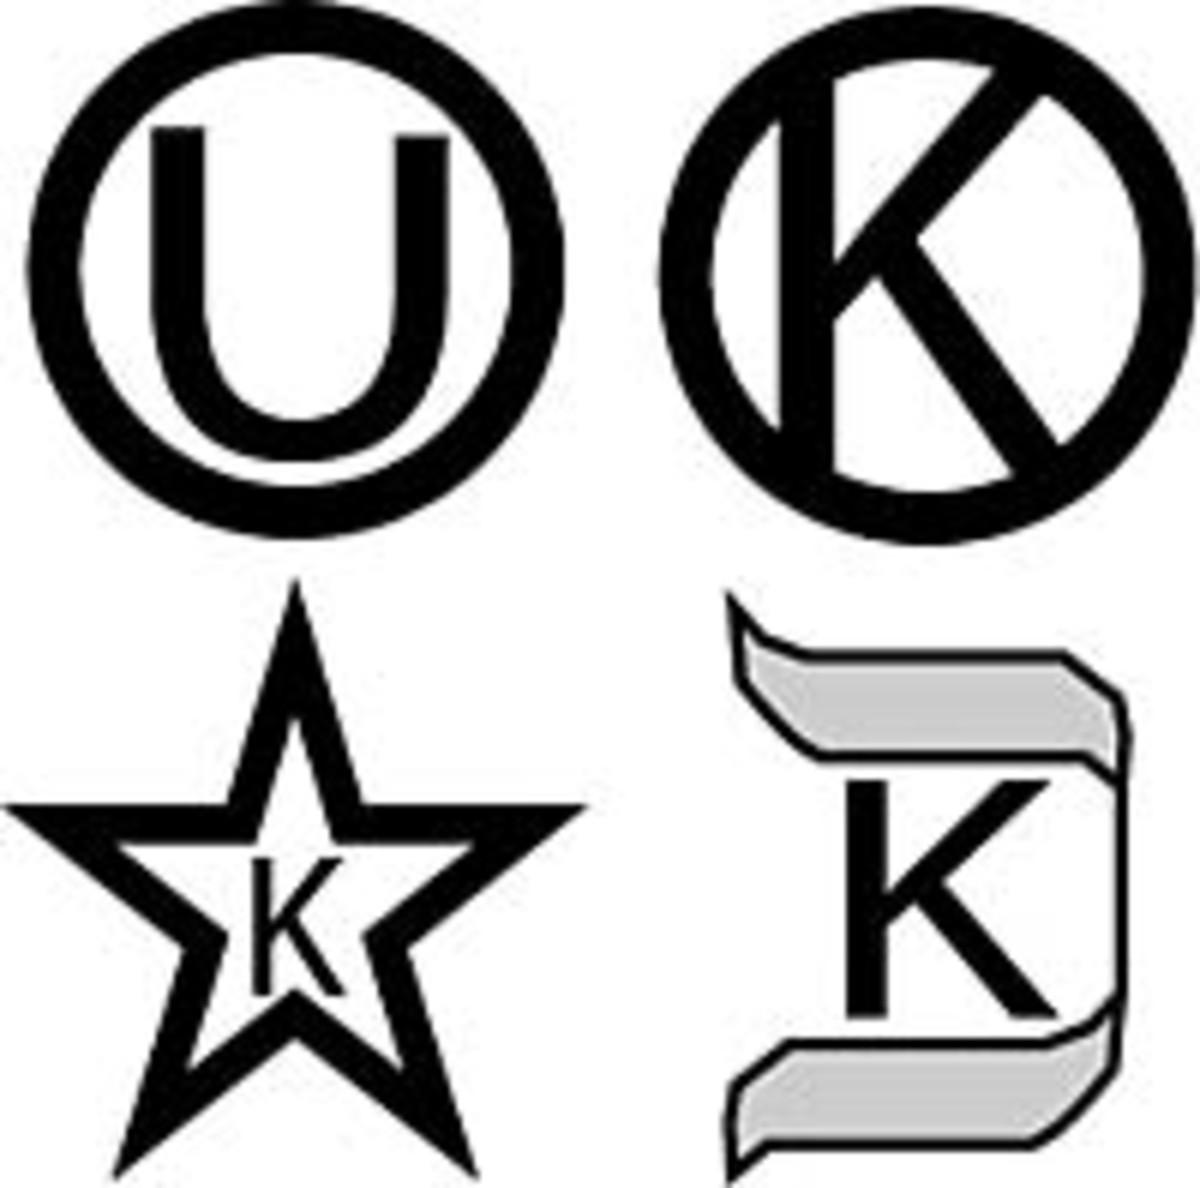 Kosher symbols on food images symbol and sign ideas its official kosher is the best thing since sliced bread joy kosher symbols buycottarizona biocorpaavc